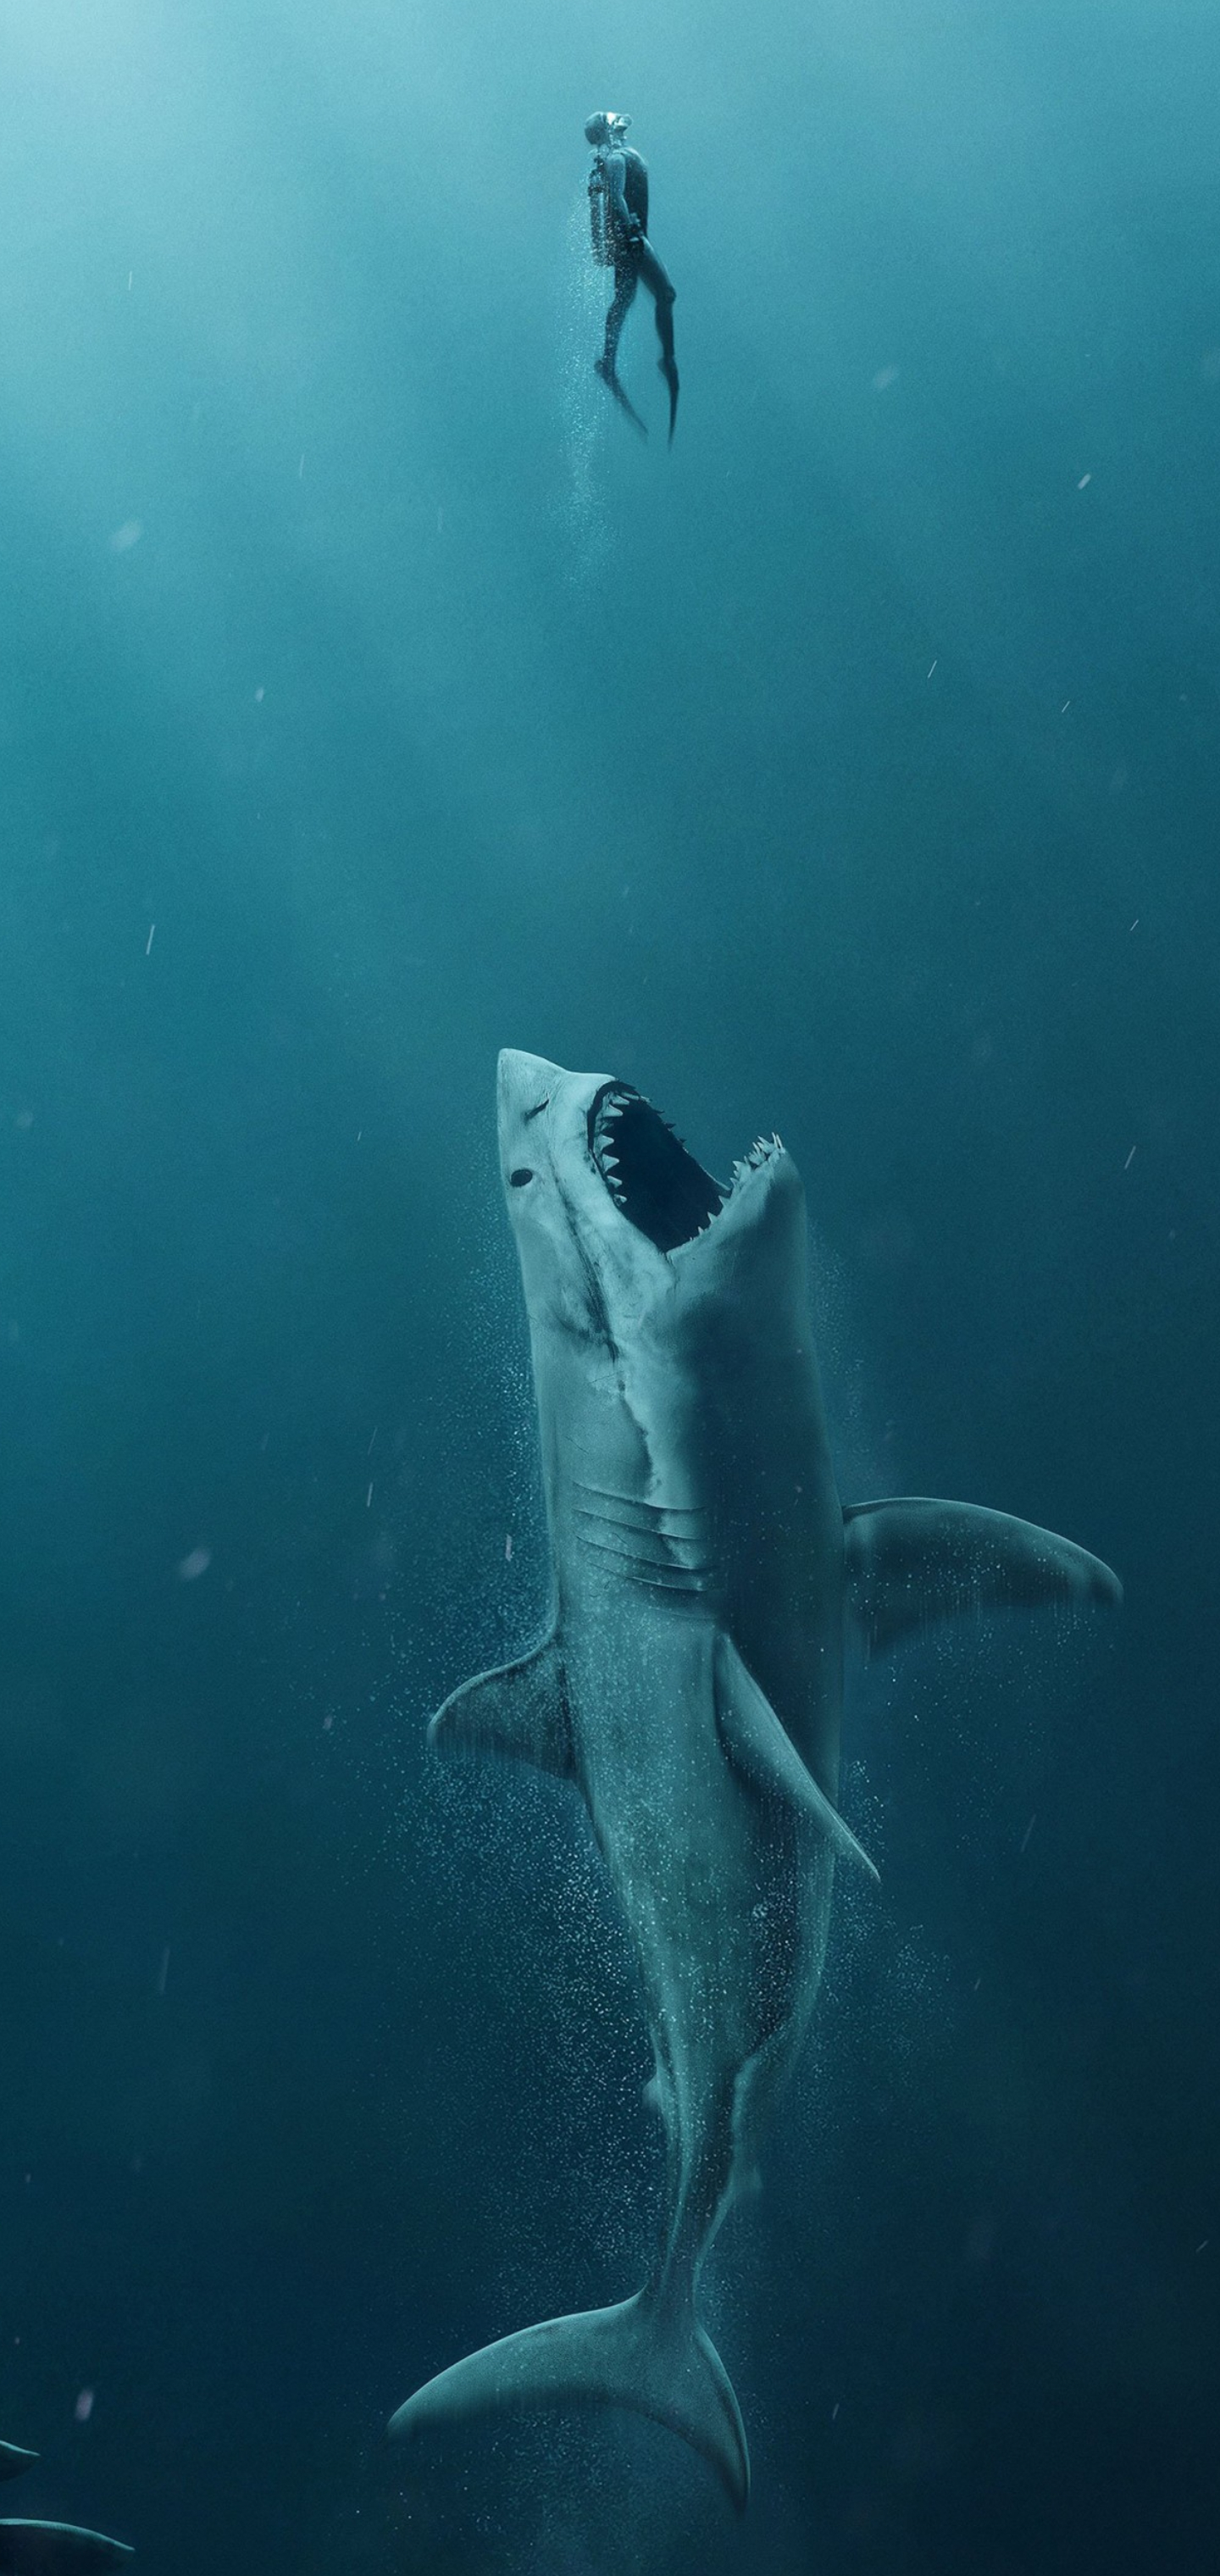 Köpəkbalığı Note 10 Plus HD Divar kağızları